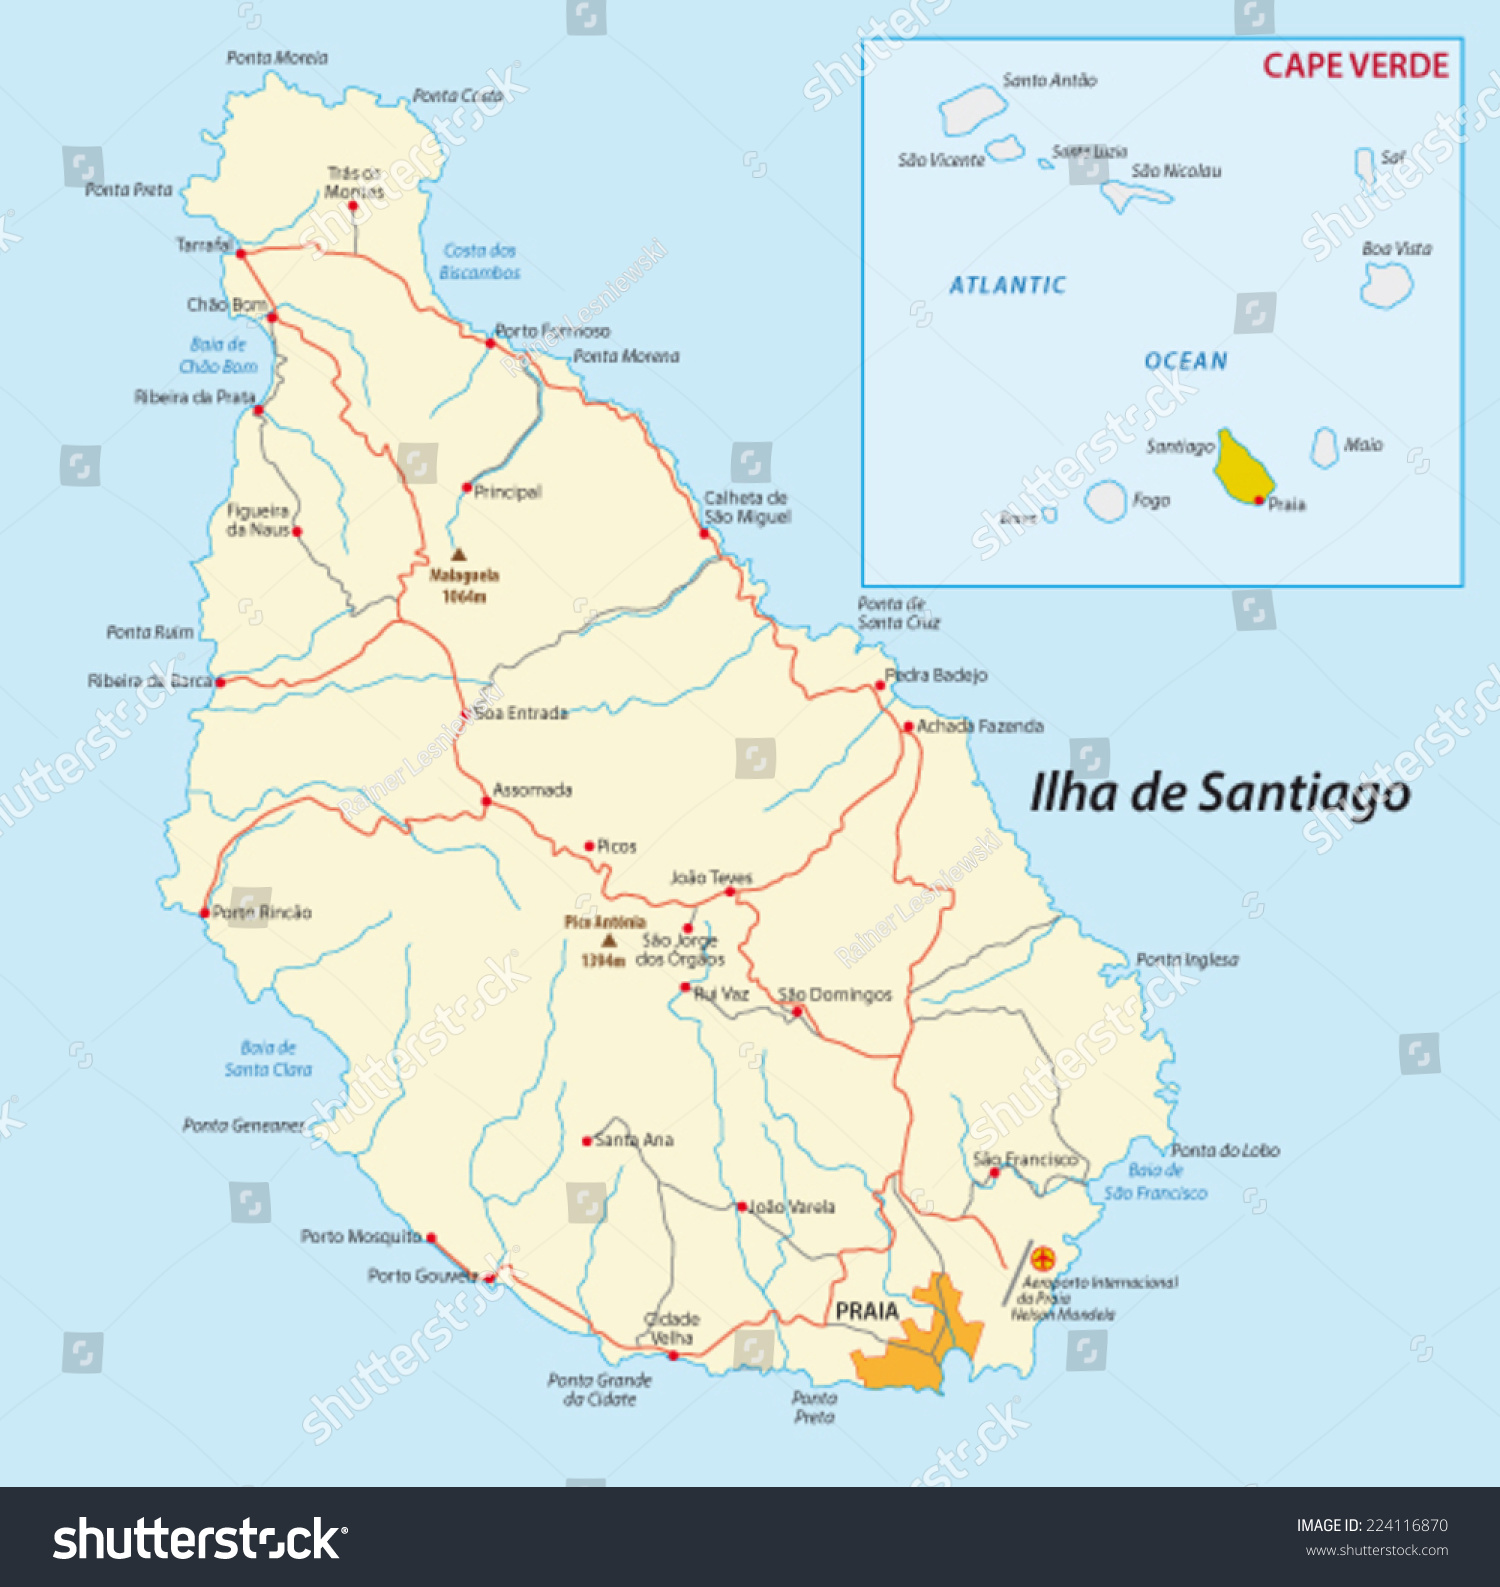 Santiago Islandcape Verde Map Stock Vector Shutterstock - Cape verde map